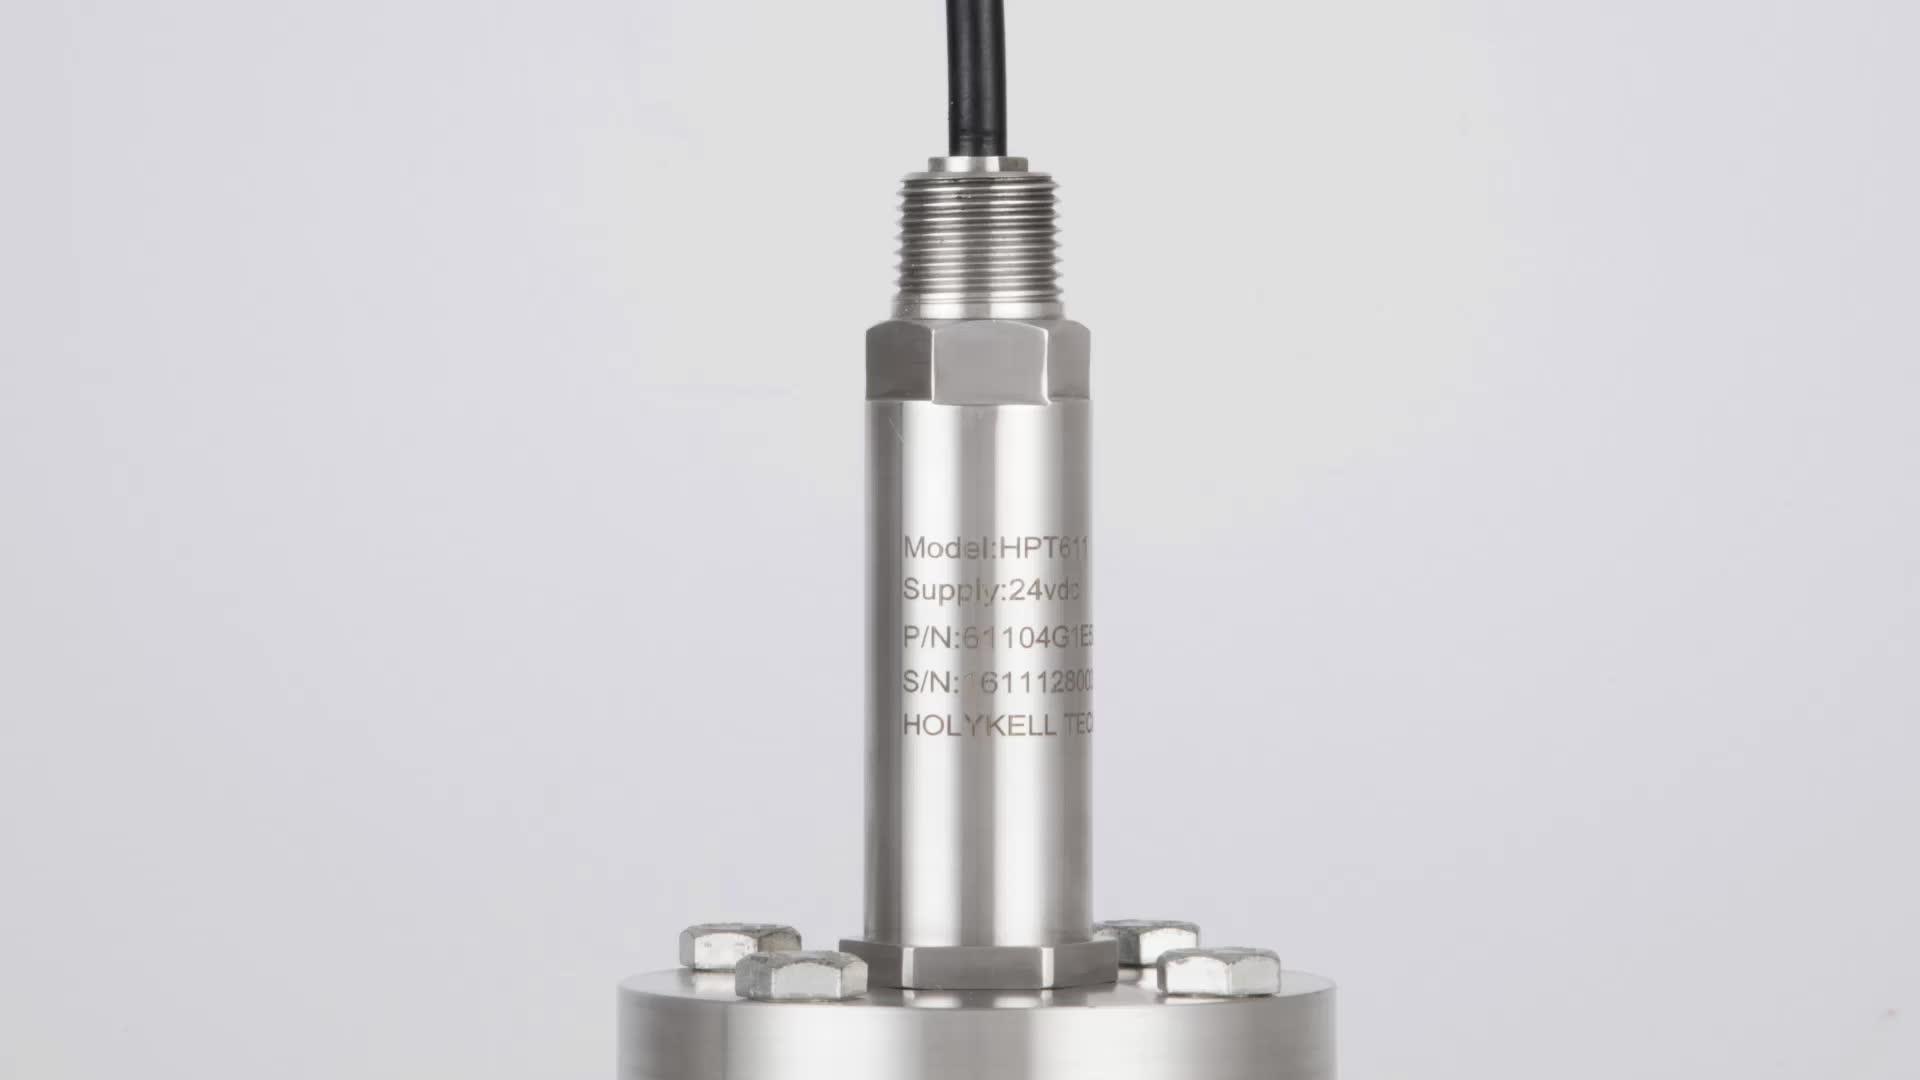 Holykell factory Submersible Pressure Level Transducer, Flange Level Sensor